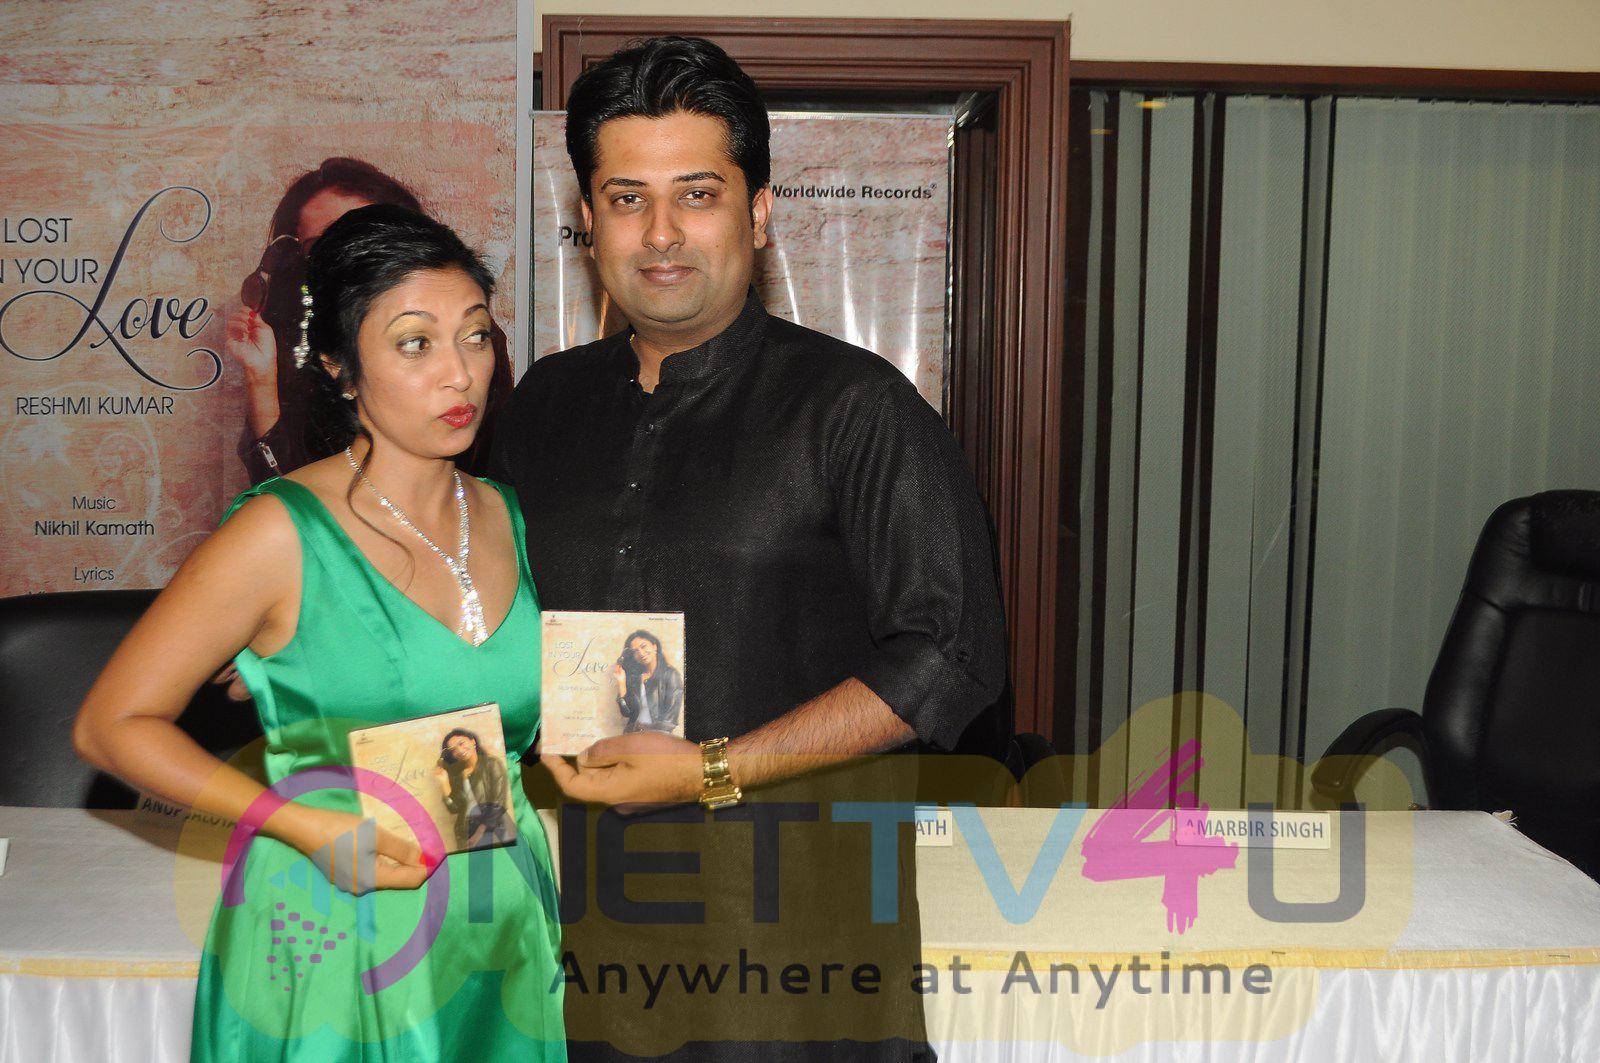 Photos Of Bhajan Singer Anup Jalota During A Music Album Launch Of Reshmi Kumar`Deewana Mera Dil